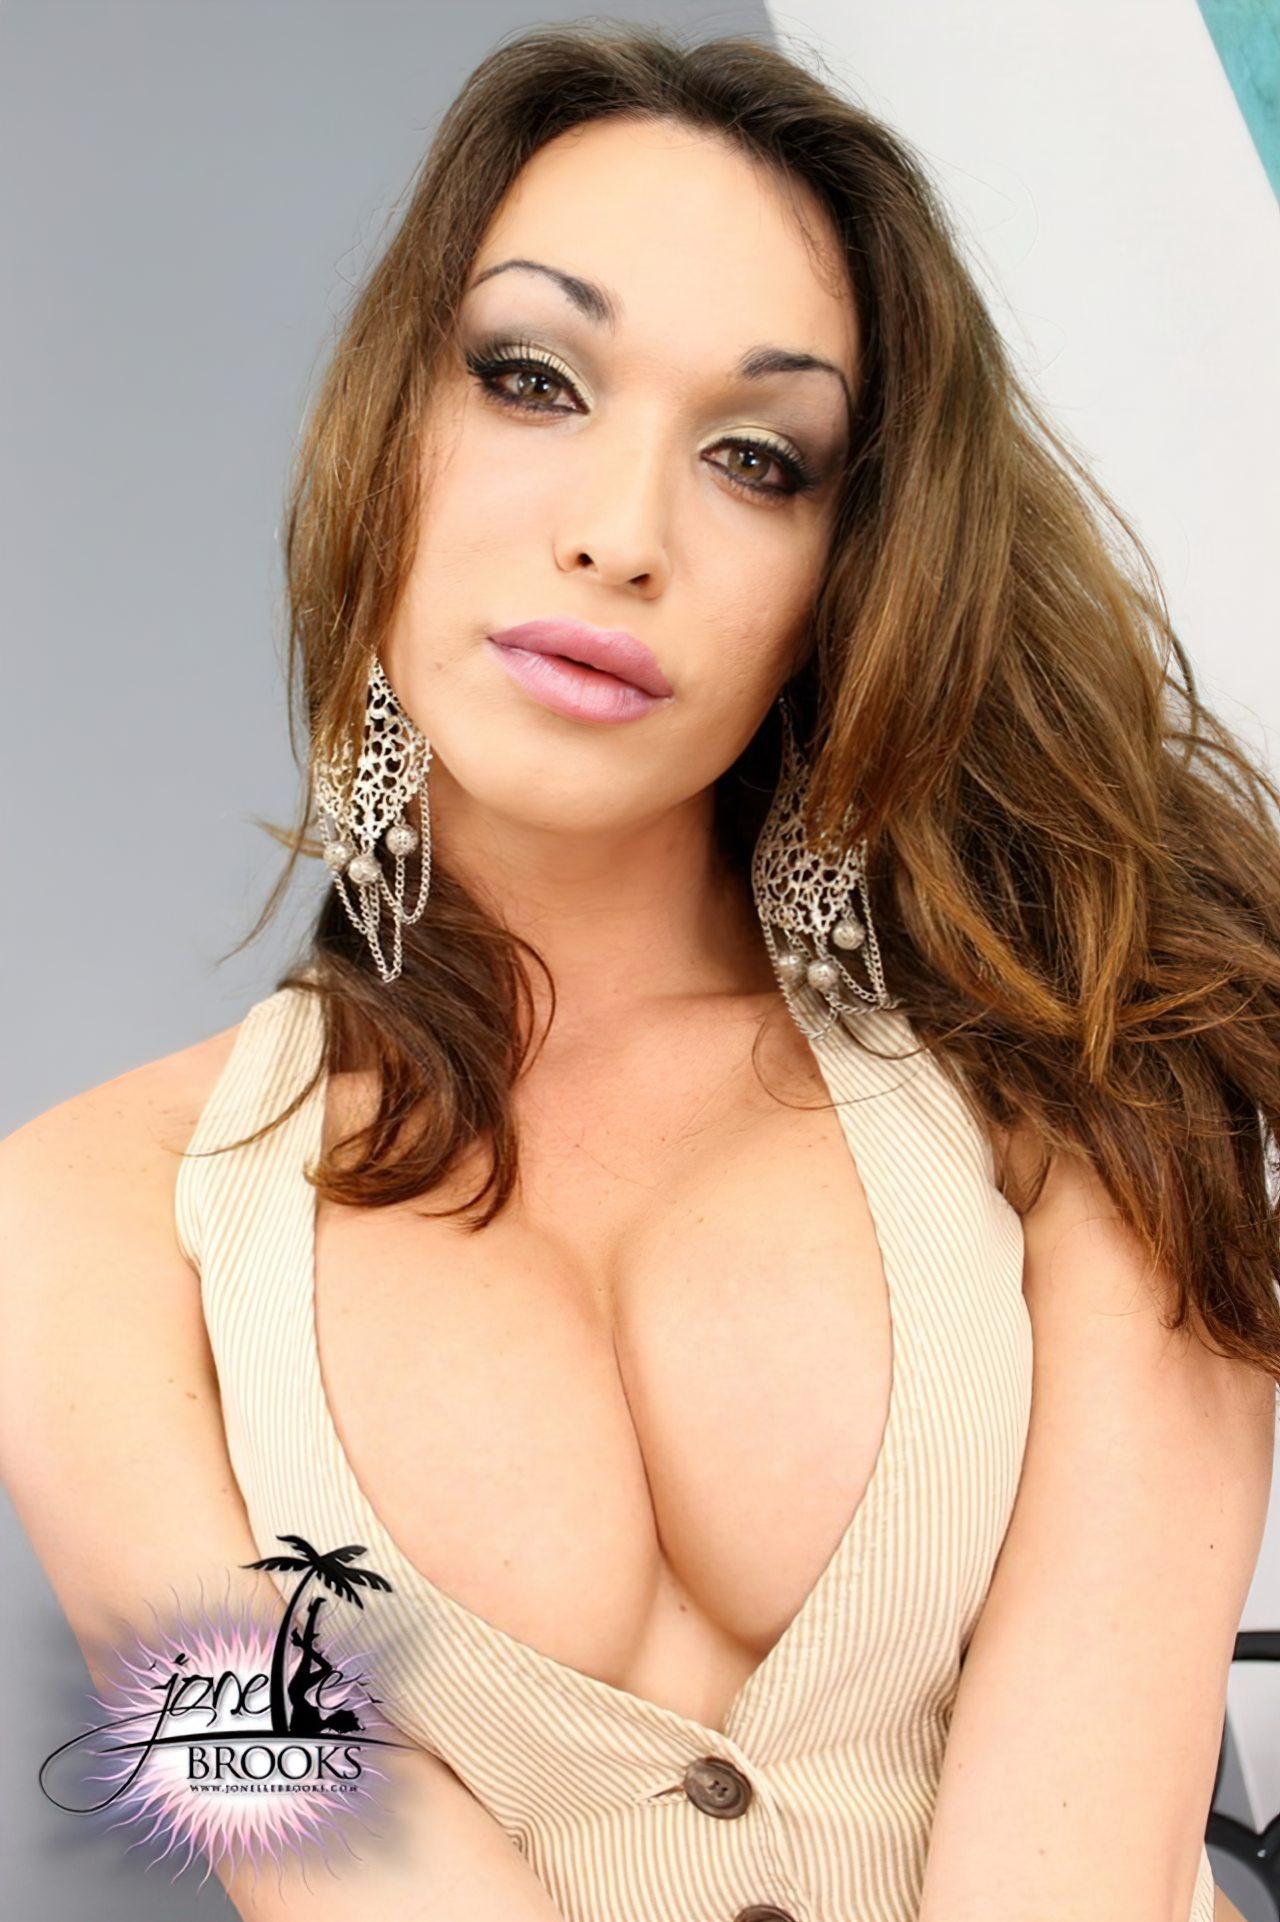 Sexy Jonelle Brooks (1)